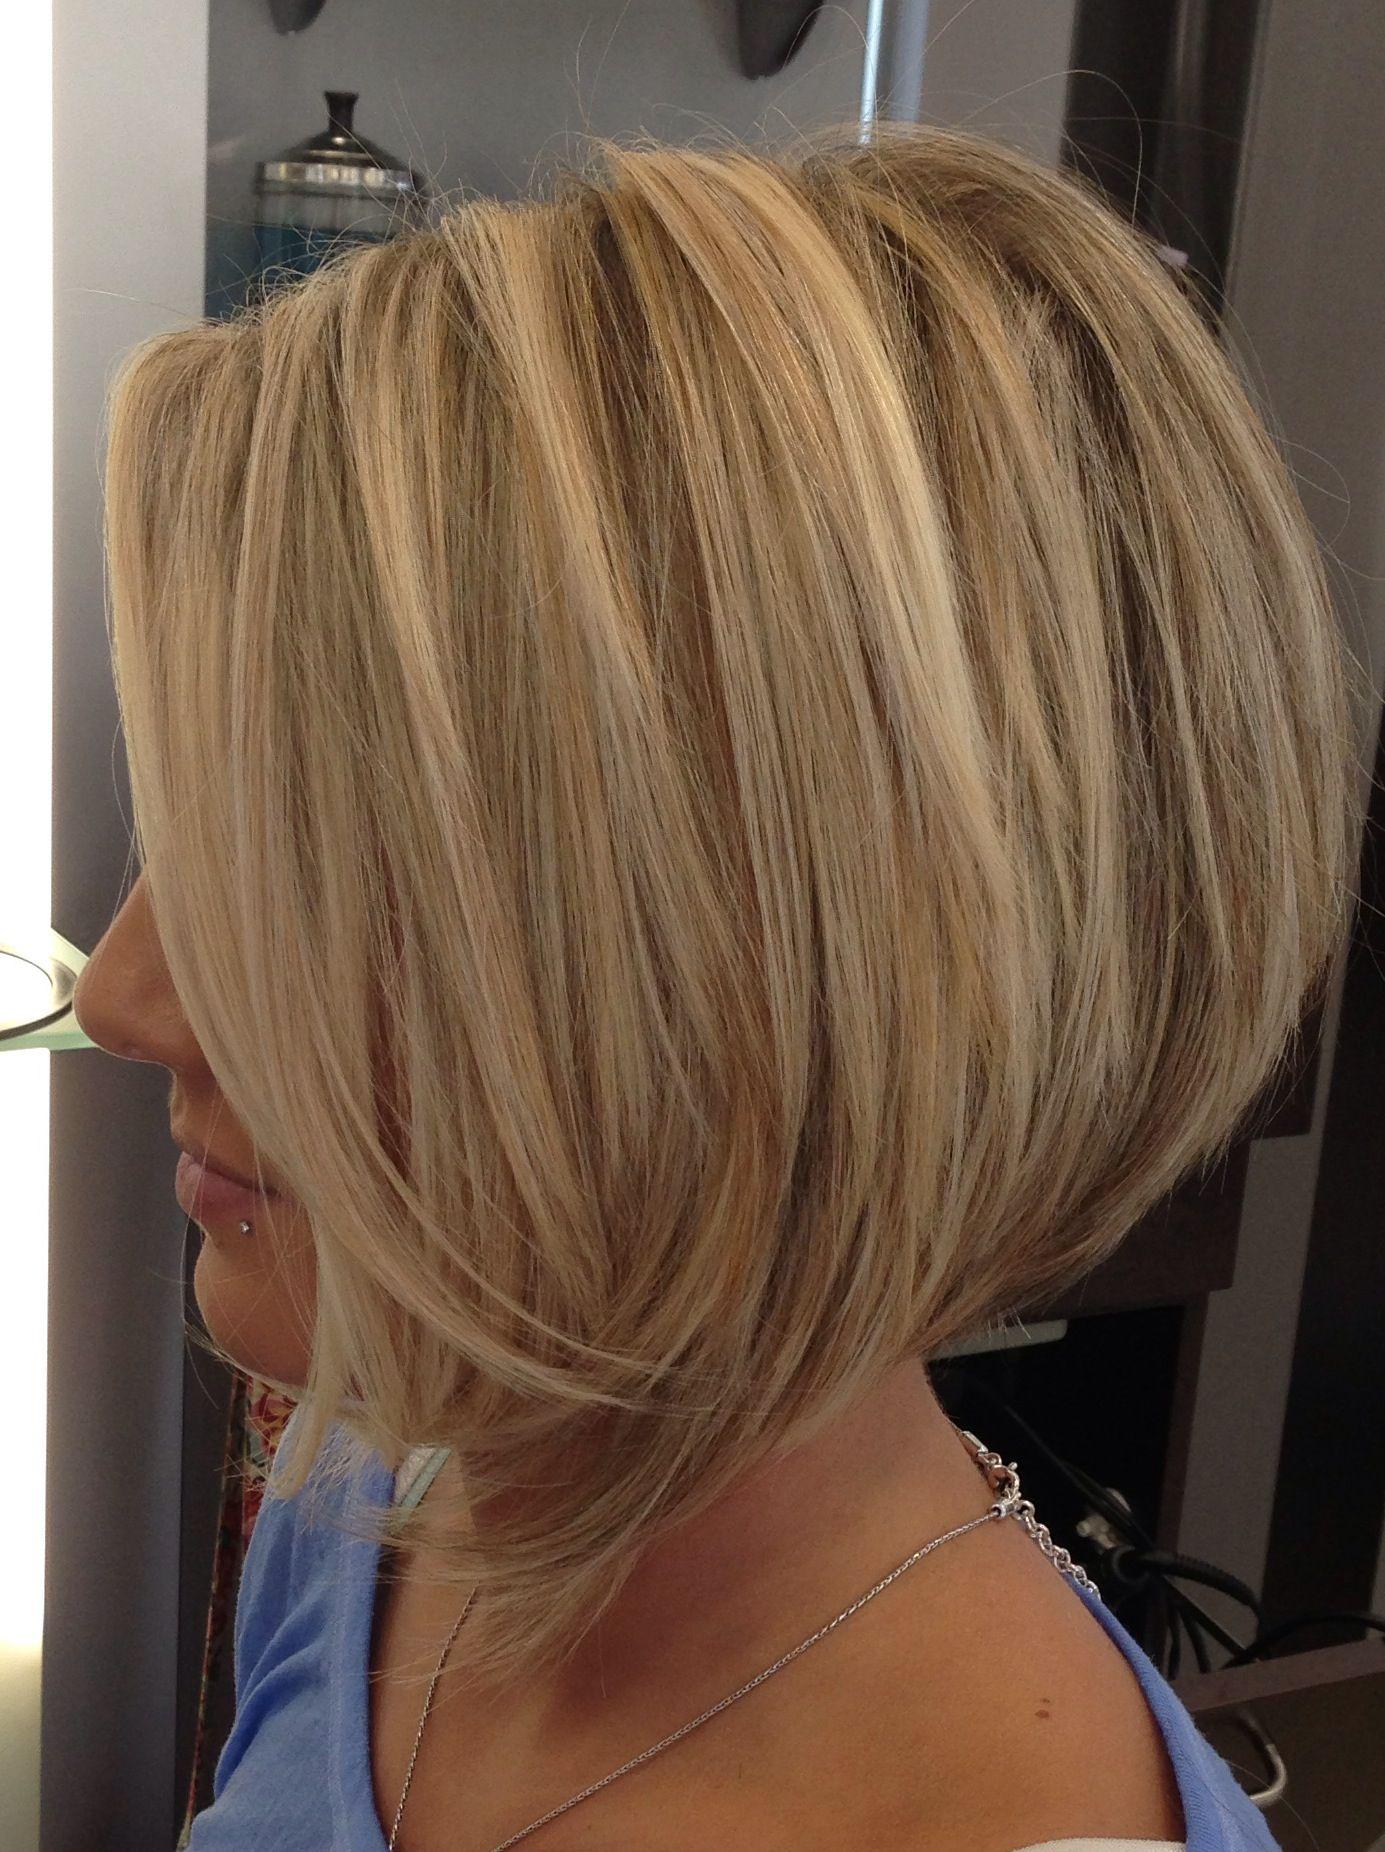 Angled bob for my next hair cut Short Haircuts Pinterest